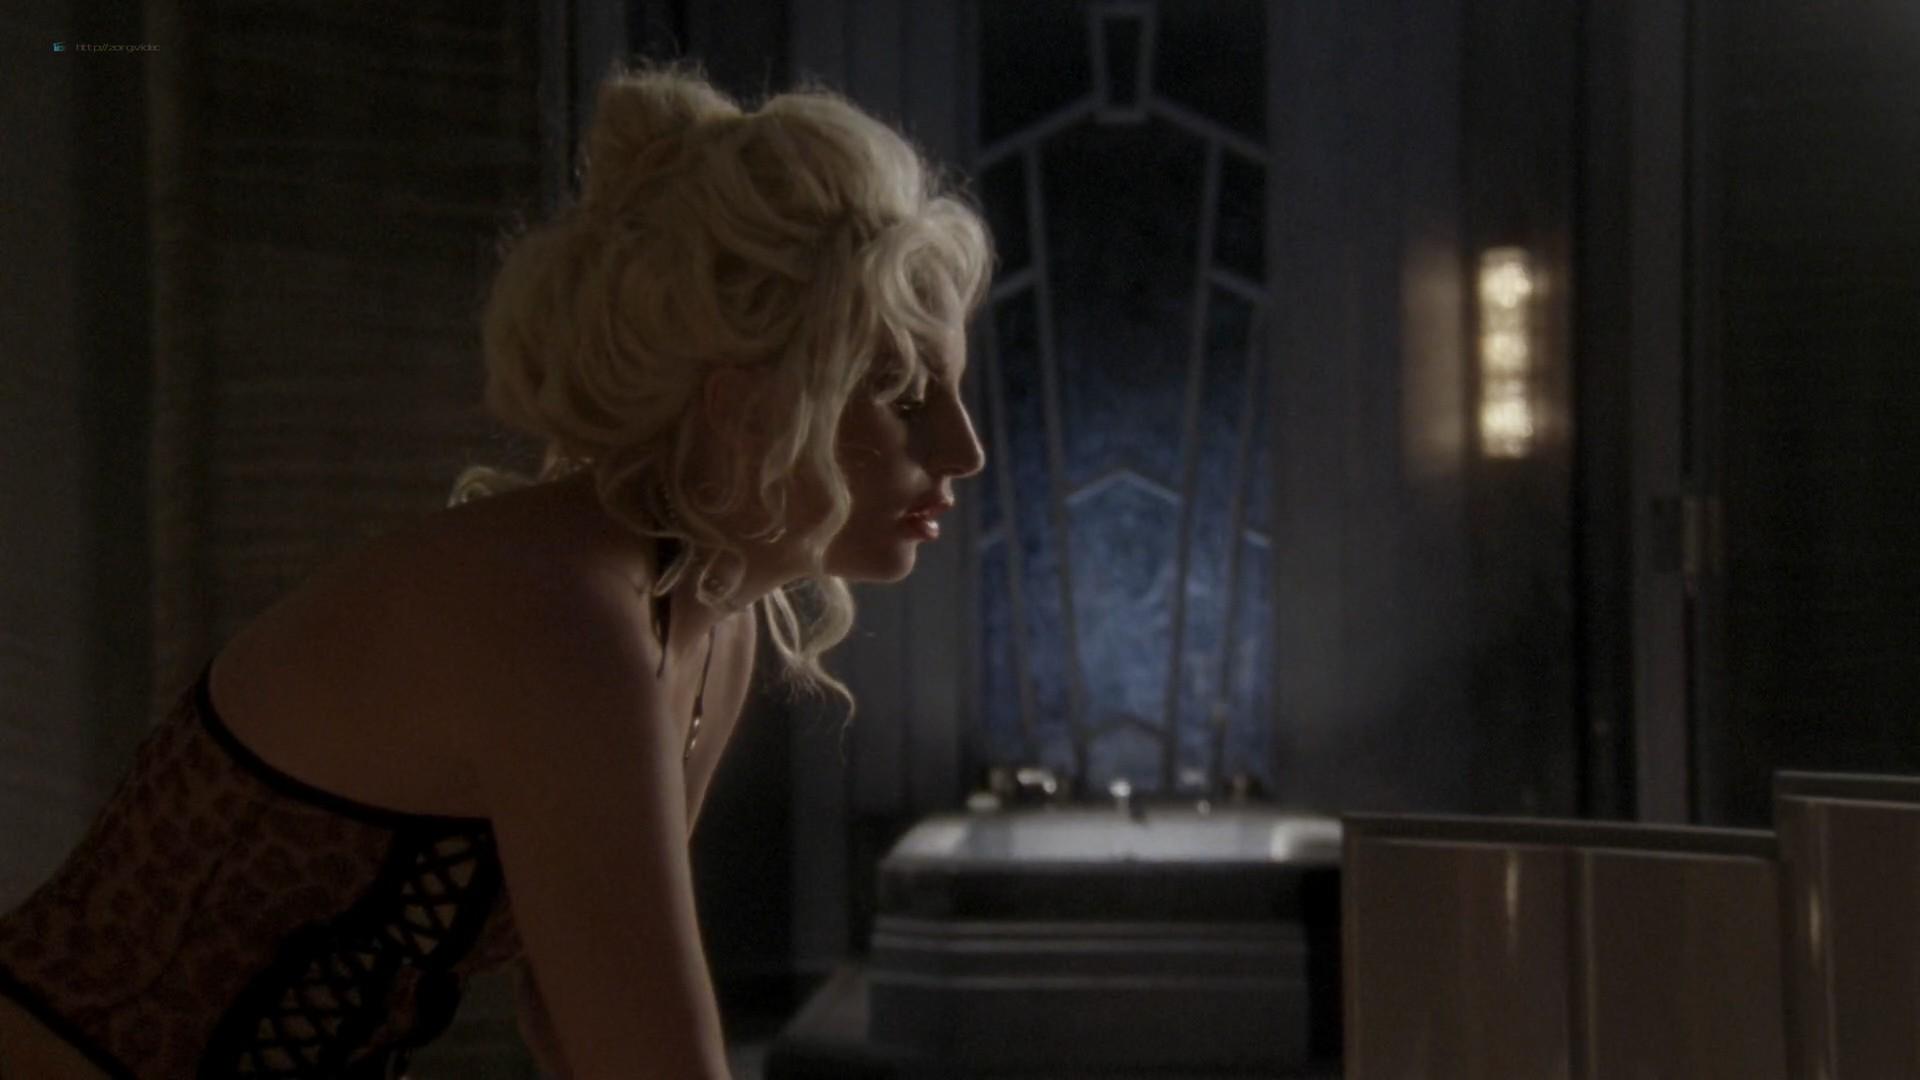 Lady Gaga and Angela Bassett hot lesbian sex - American Horror Story (2015) s5e3 HD 1080p (11)